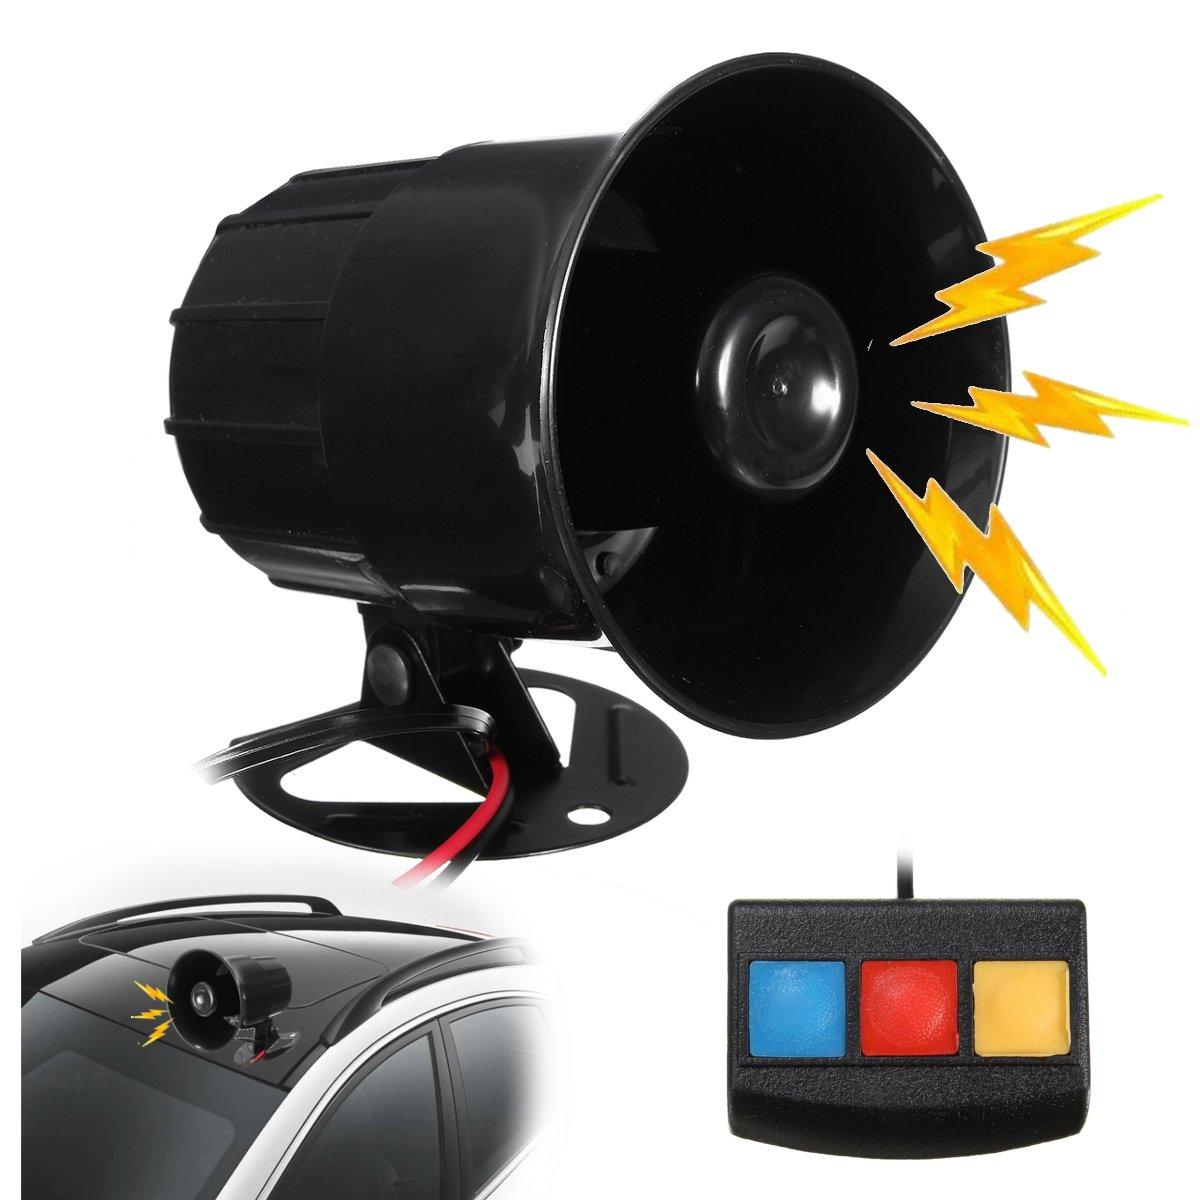 110db 12V 3 Sound PA System Loud Horn Siren Alarm Speaker For Car Motorcycle Van